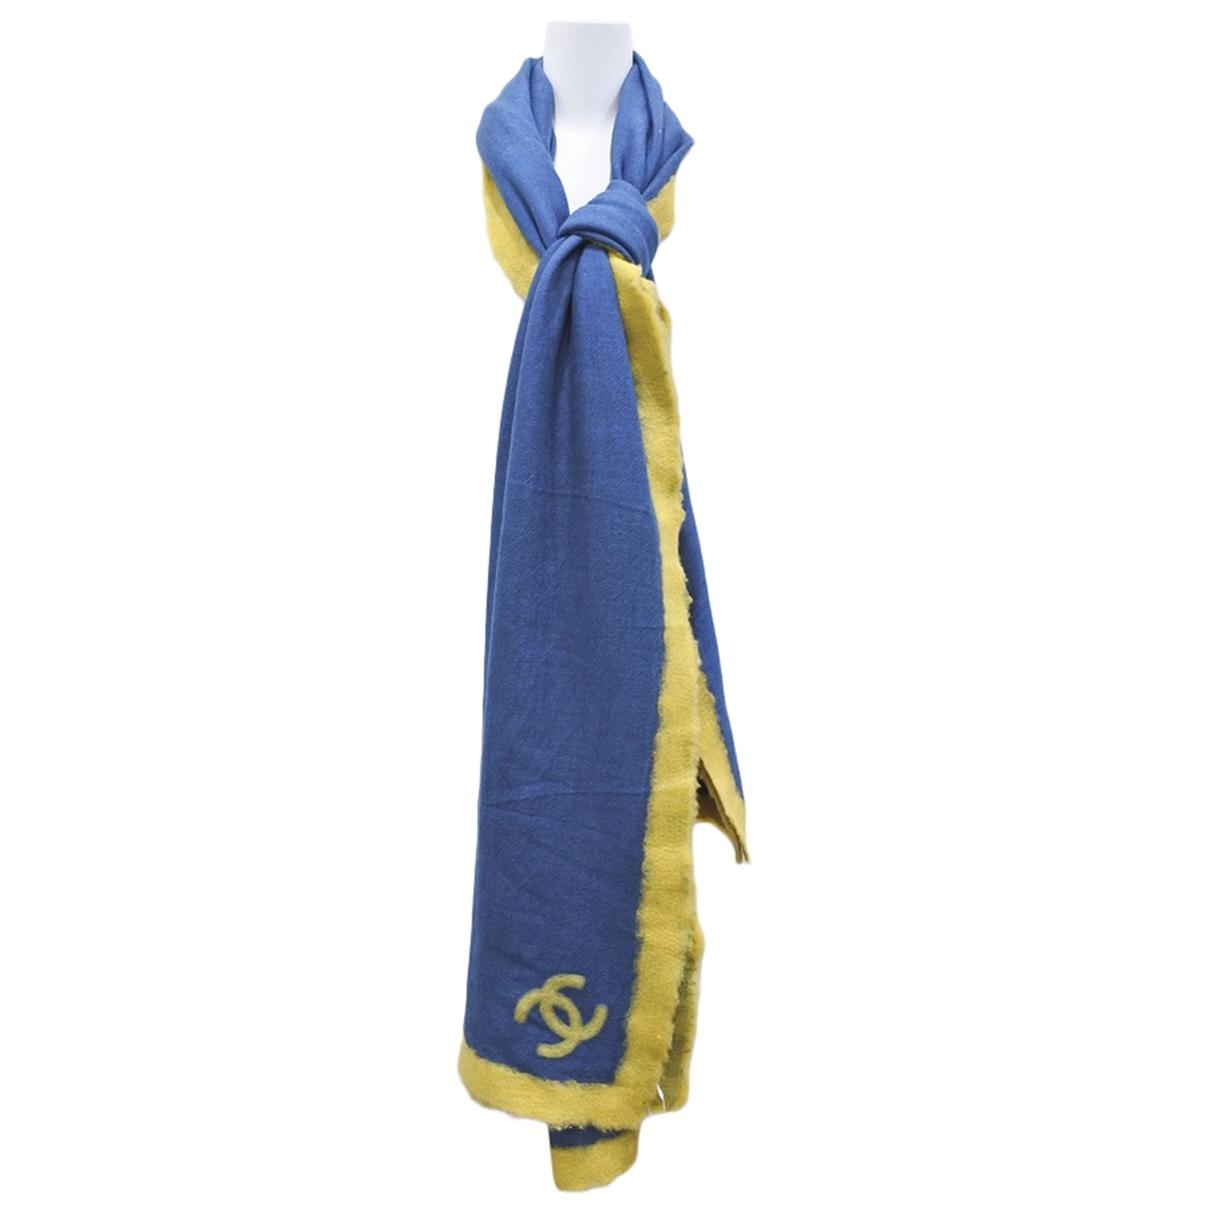 Chanel \N Schal in  Blau Wolle